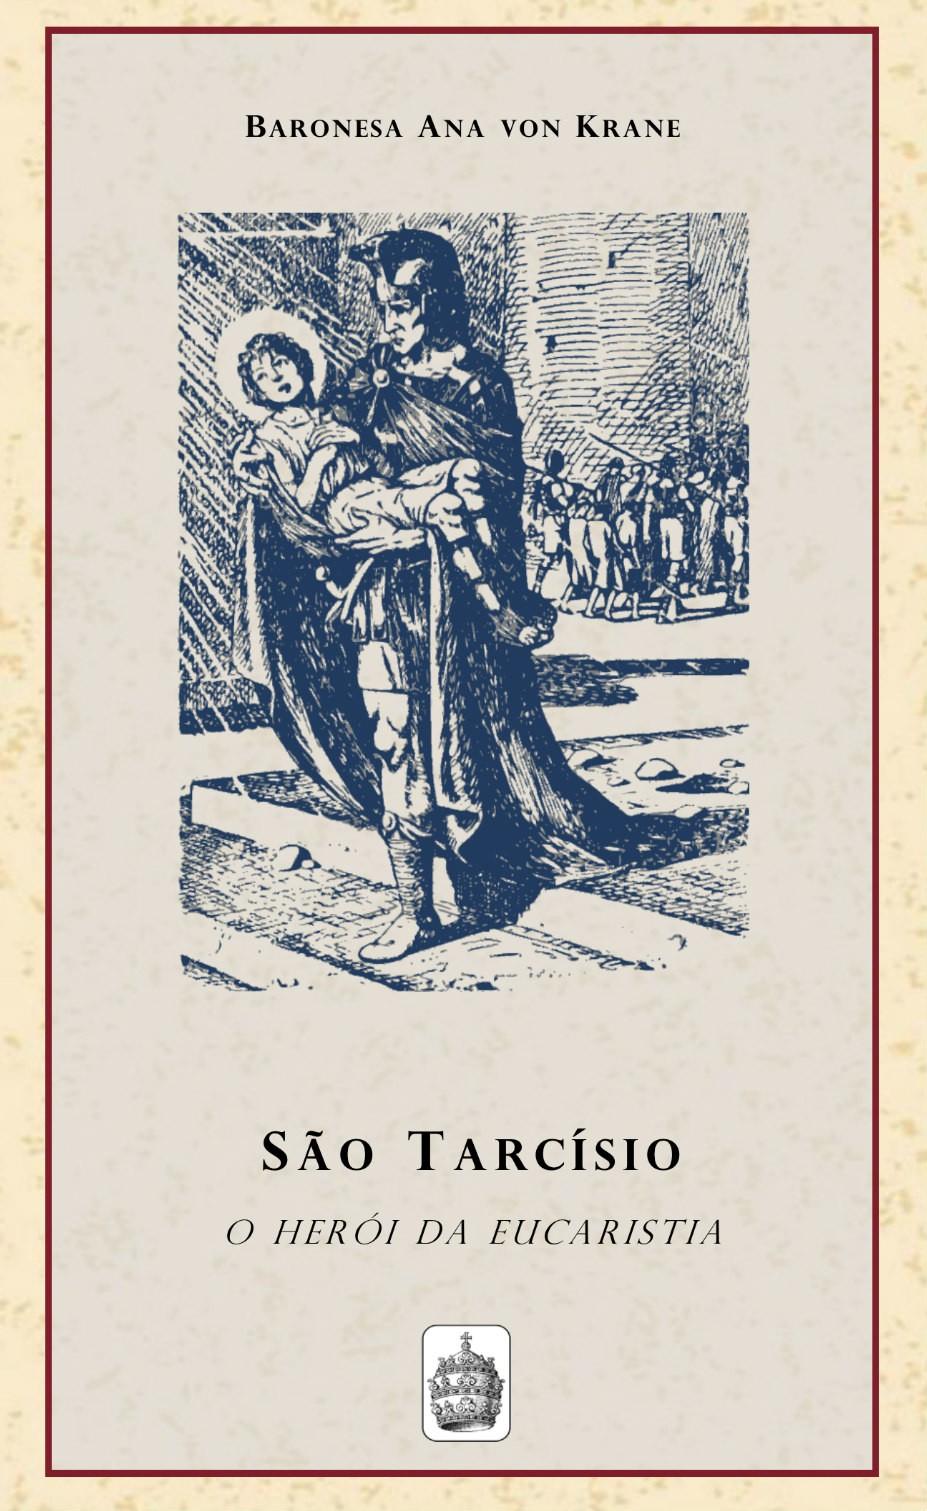 São Tarcísio, o herói da eucaristia - Baronesa Ana von Krane